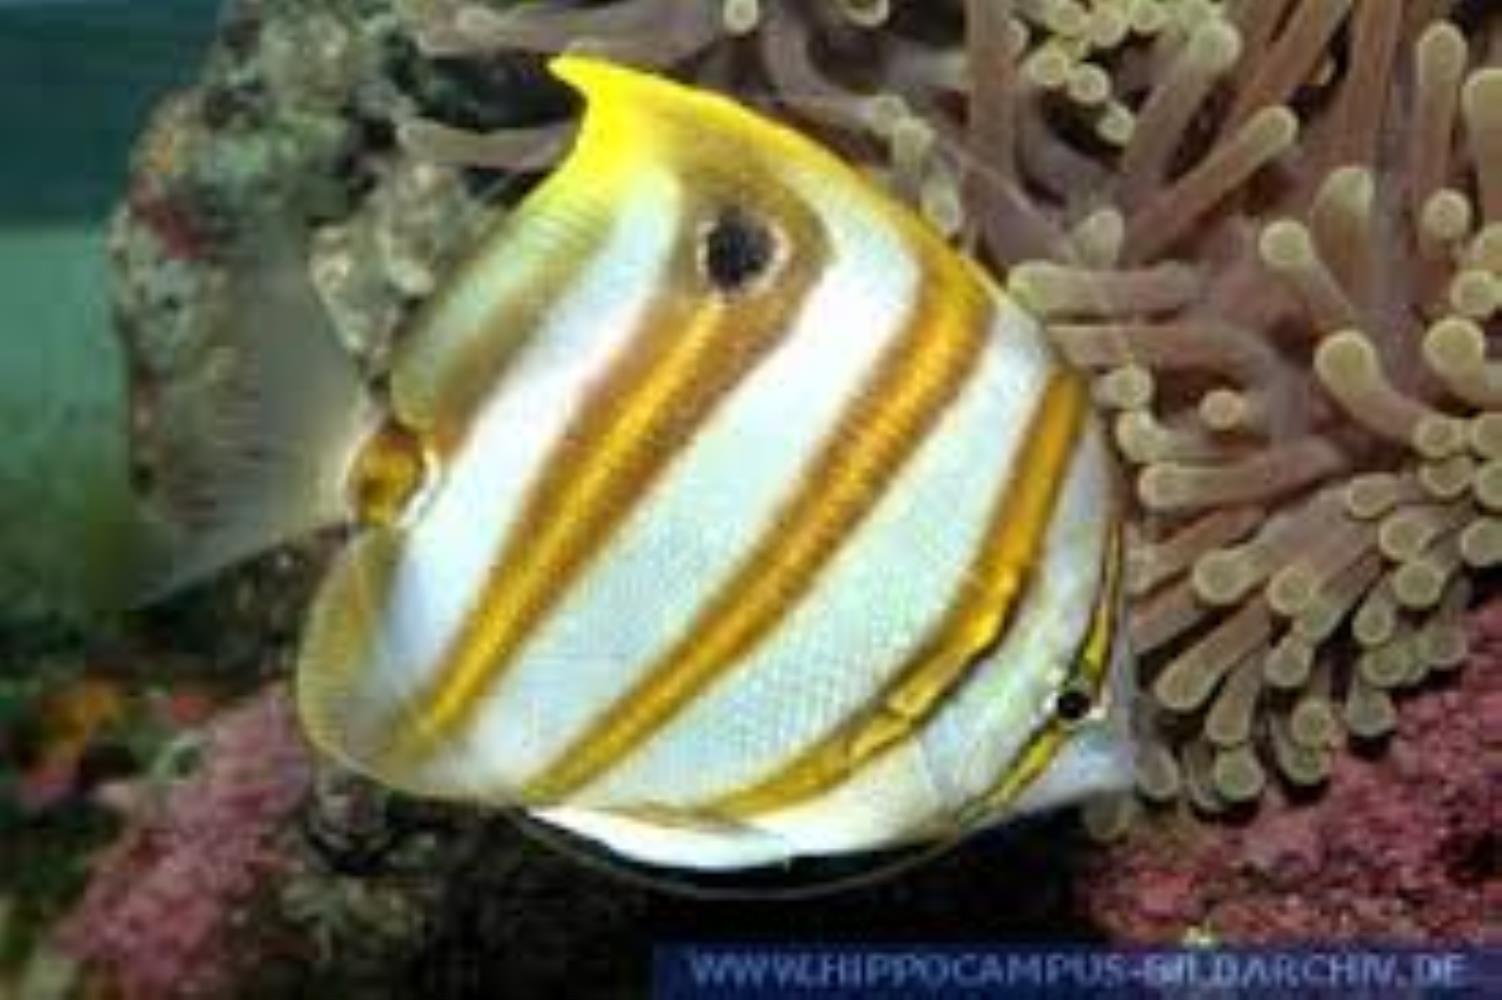 Sixspine Butterflyfish